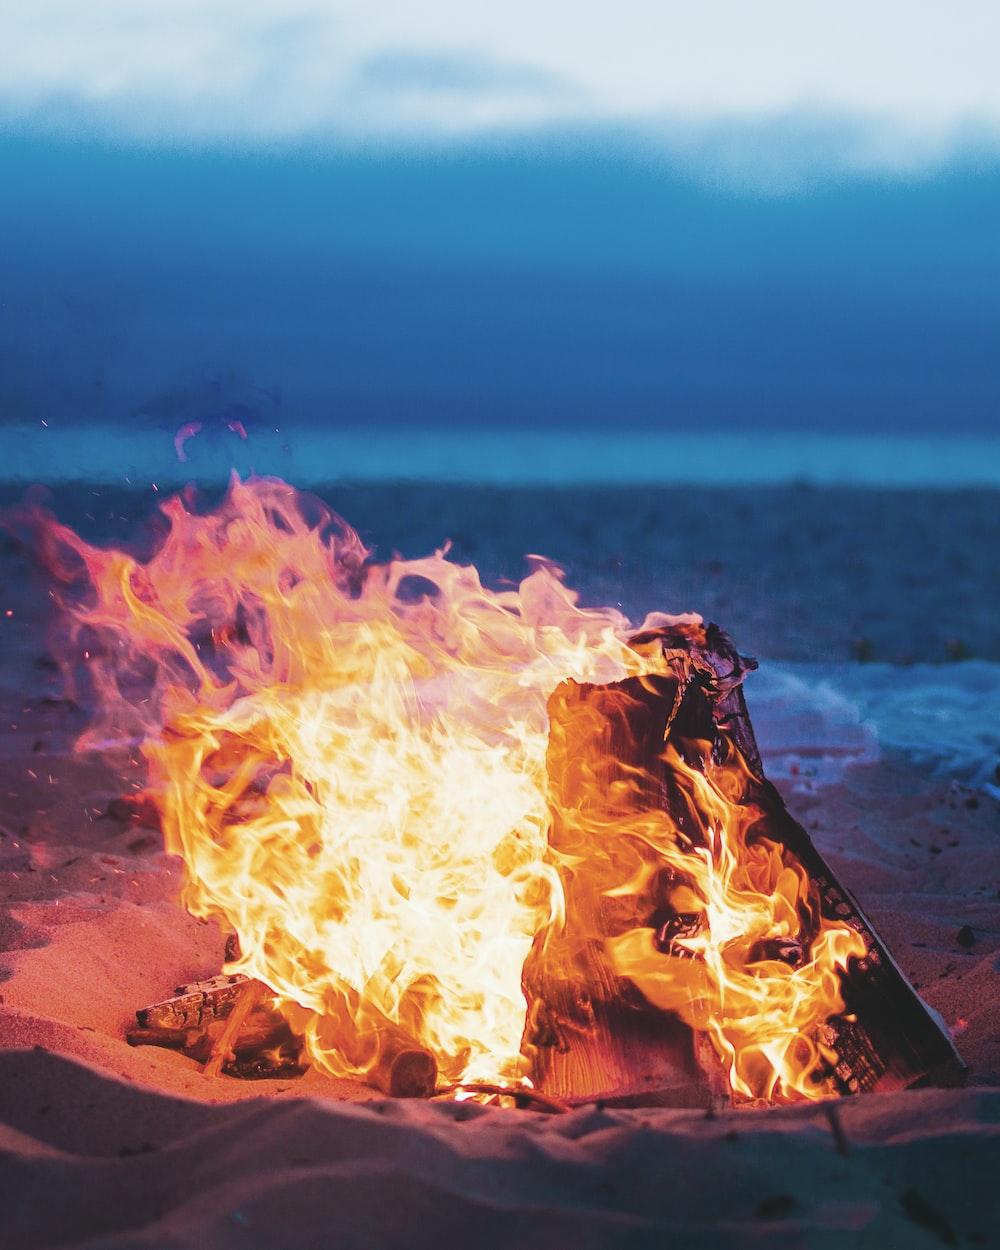 flamed bonfire near seashore